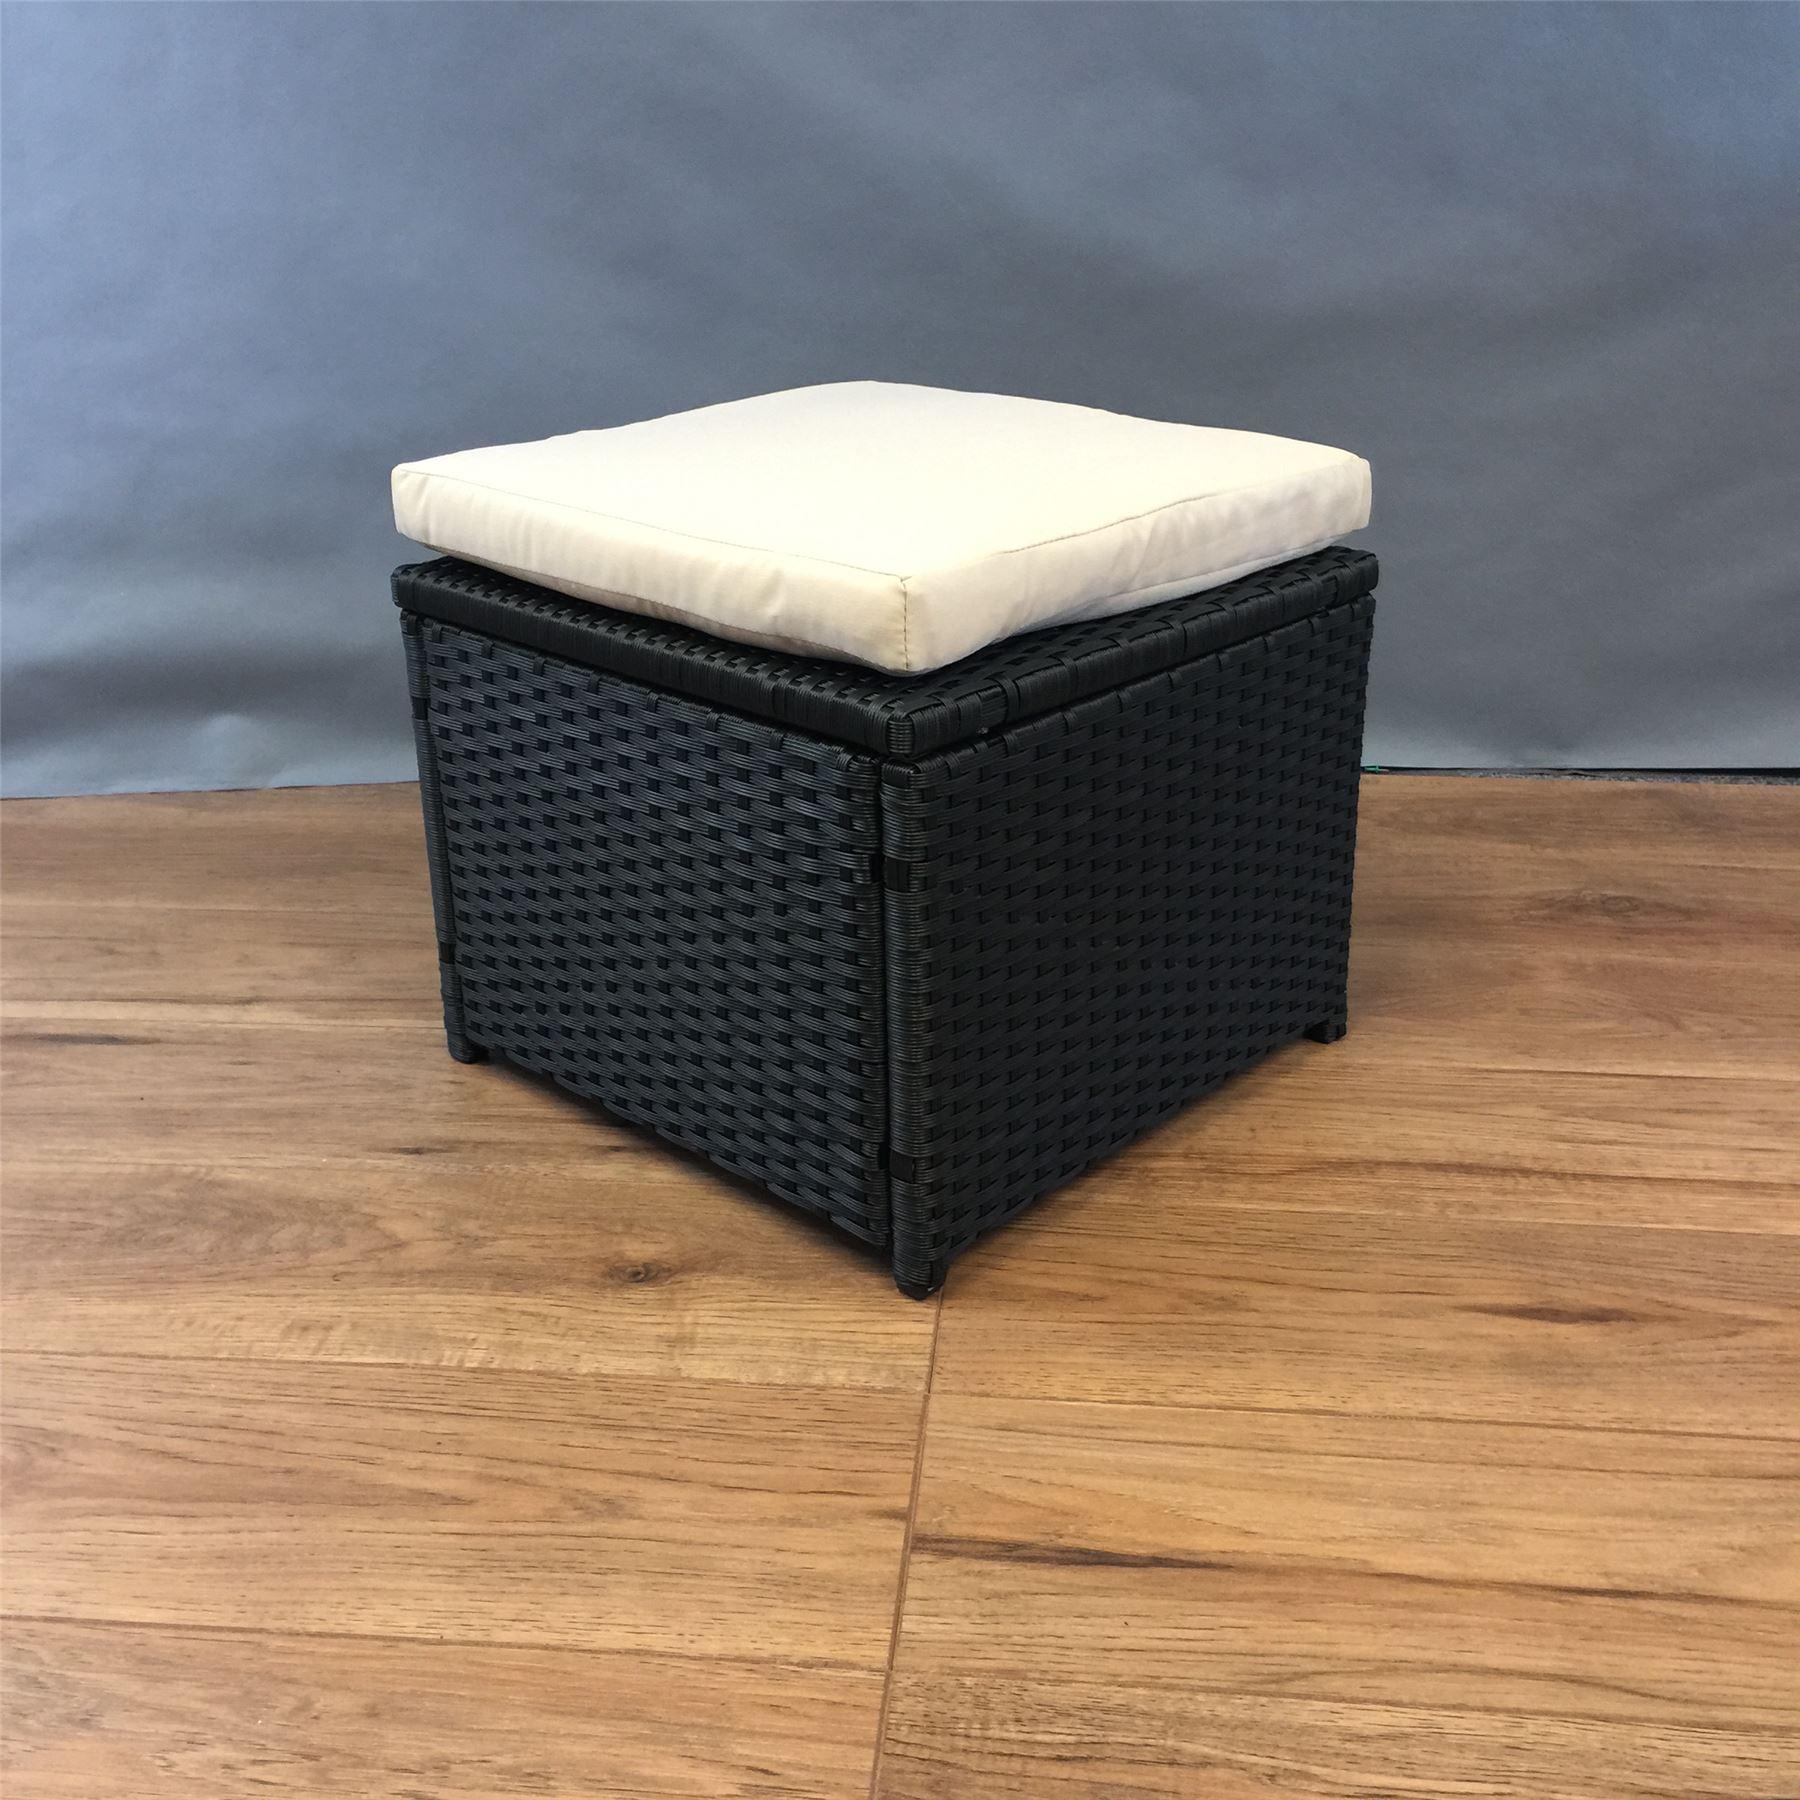 Rattan Furniture Table Foot Stood Chair Patio Garden Aluminum Frame Assembled Ebay